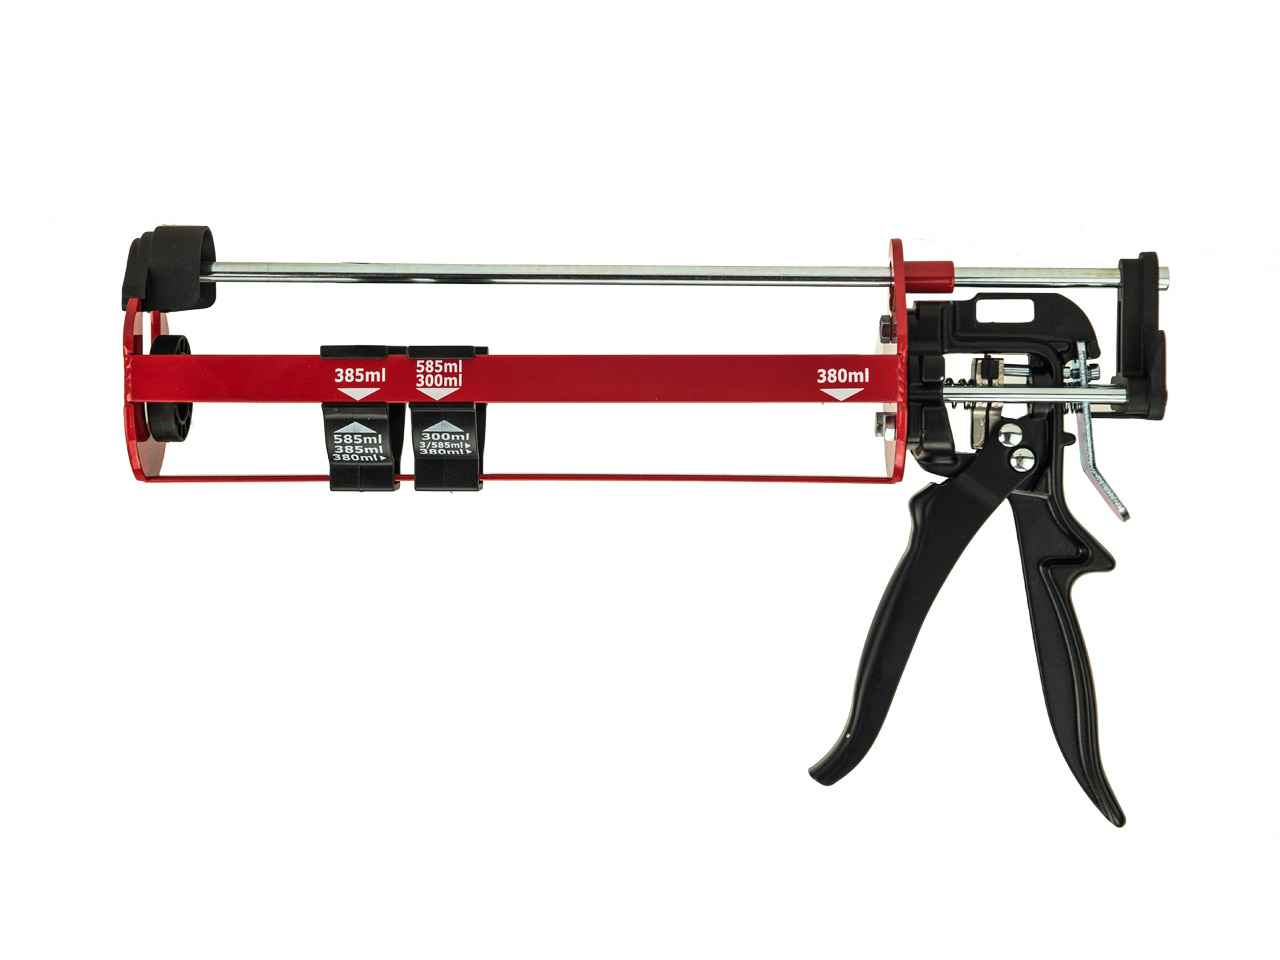 TL887 1x Vip Power Mix Applicator Gun DIY Tool Accessories